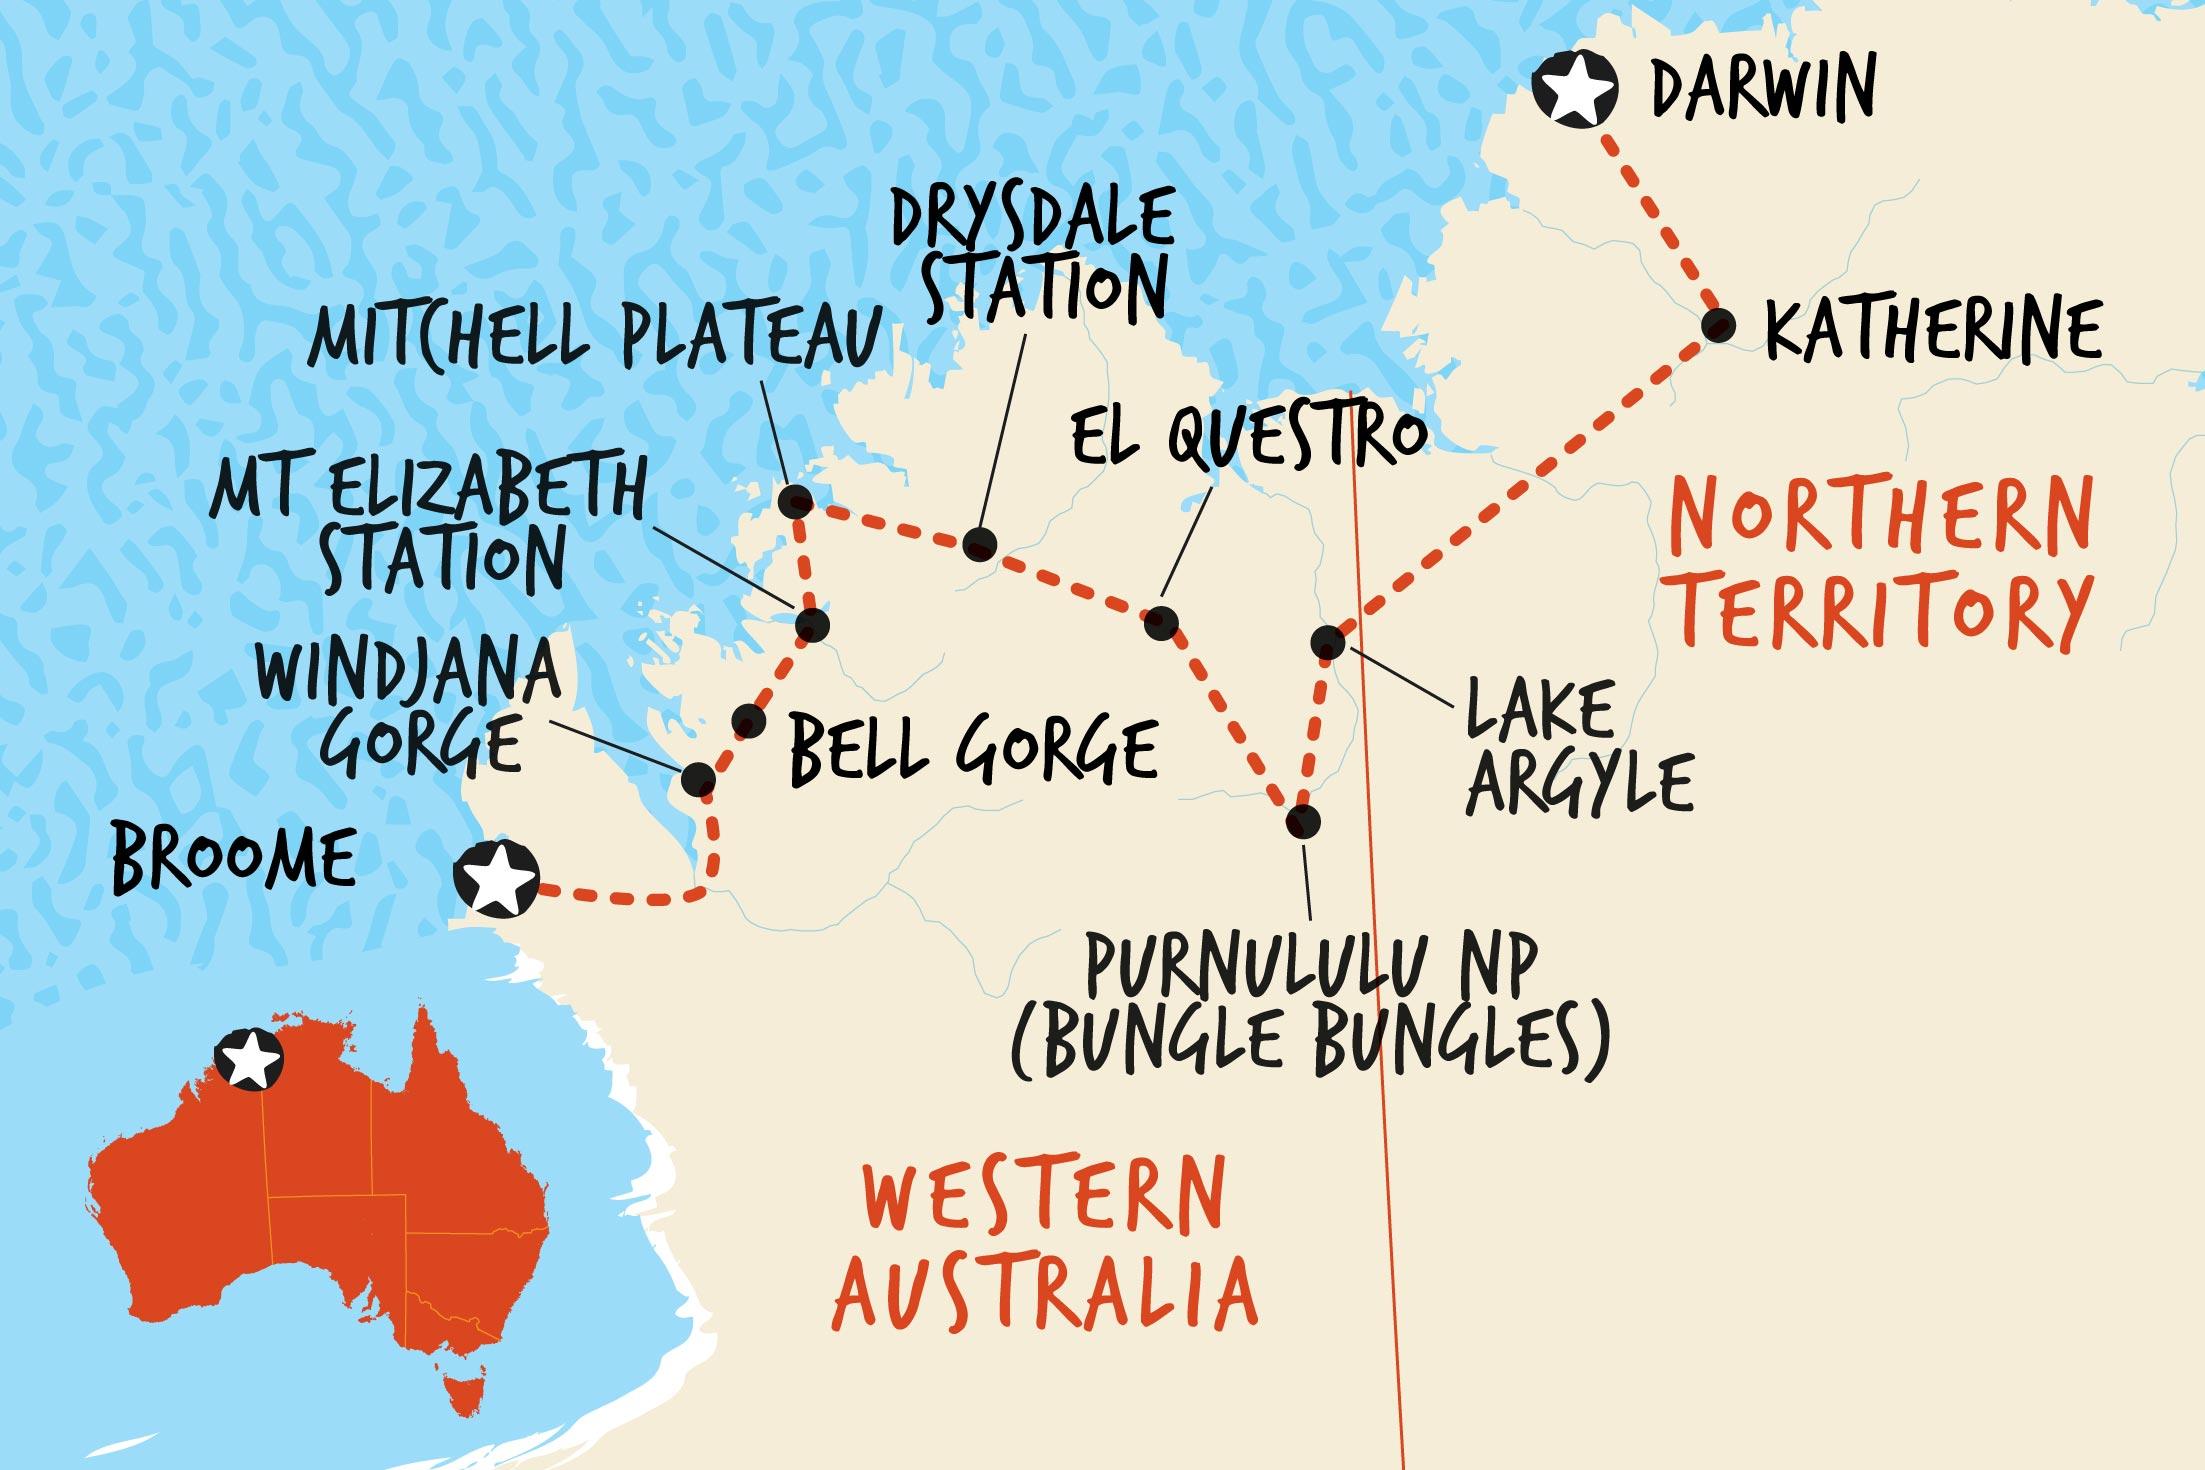 Map of Kimberley Trail Broome to Darwin including Australia